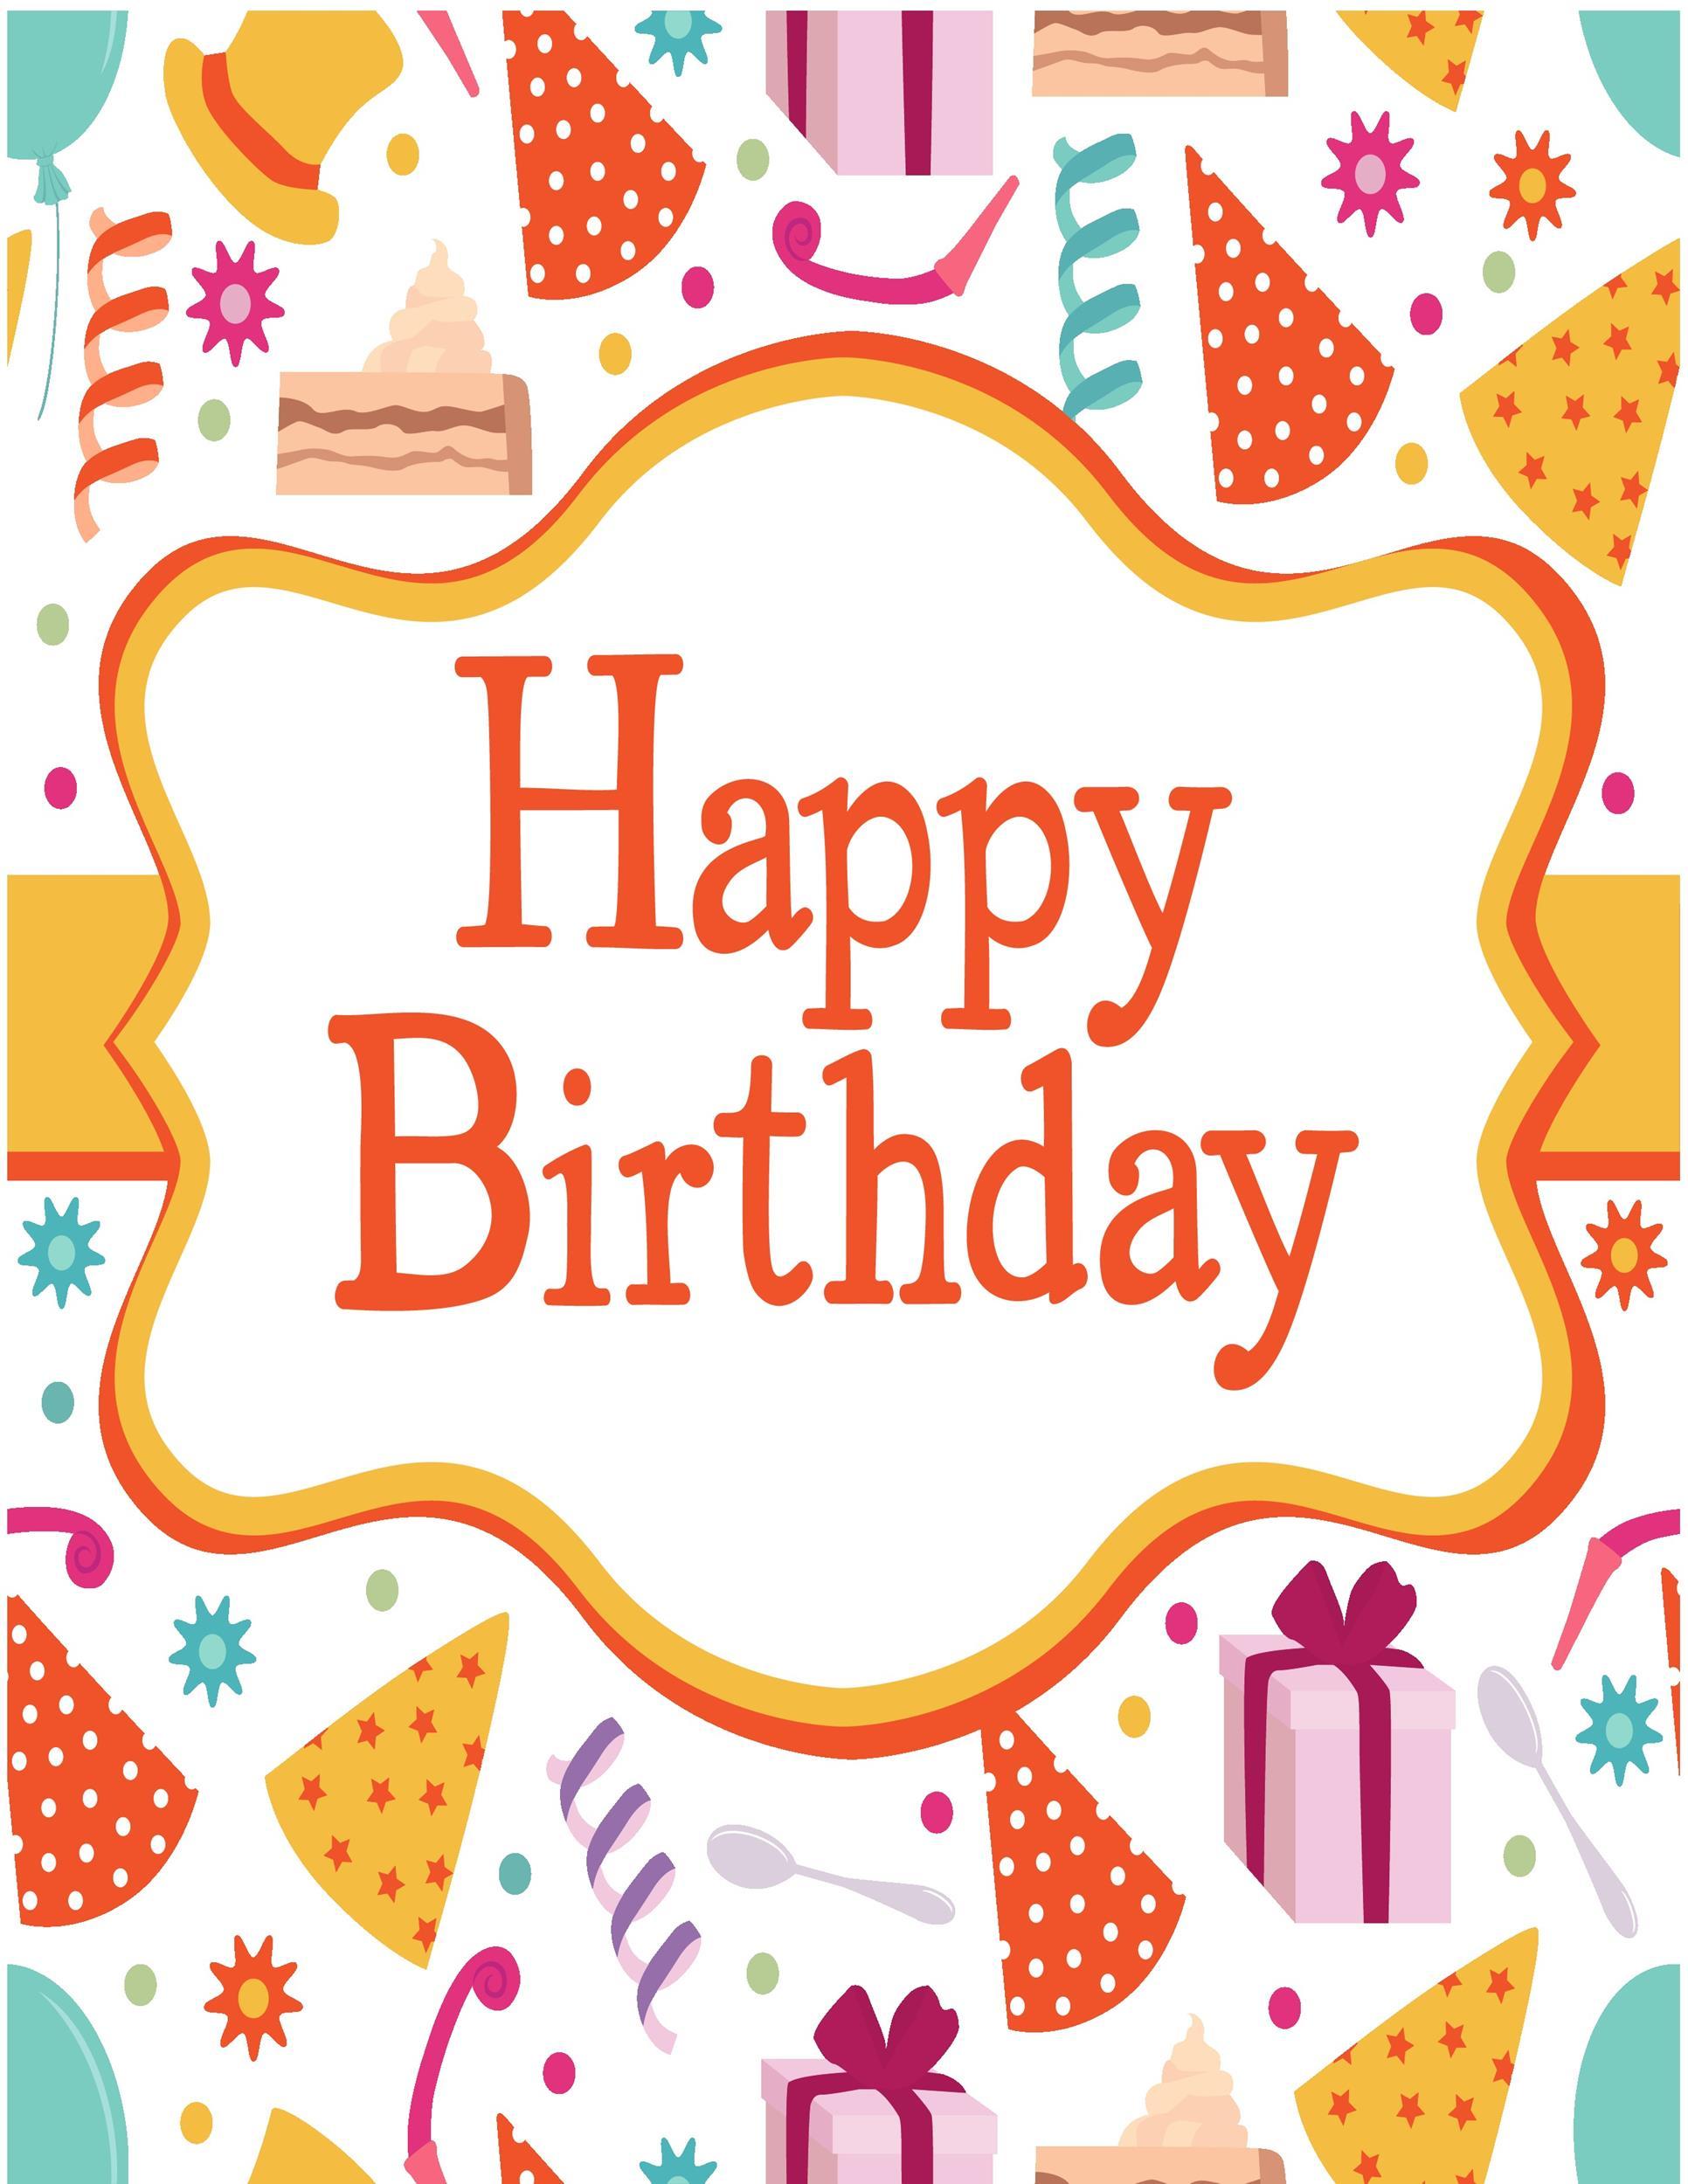 40 Free Birthday Card Templates ᐅ Templatelab